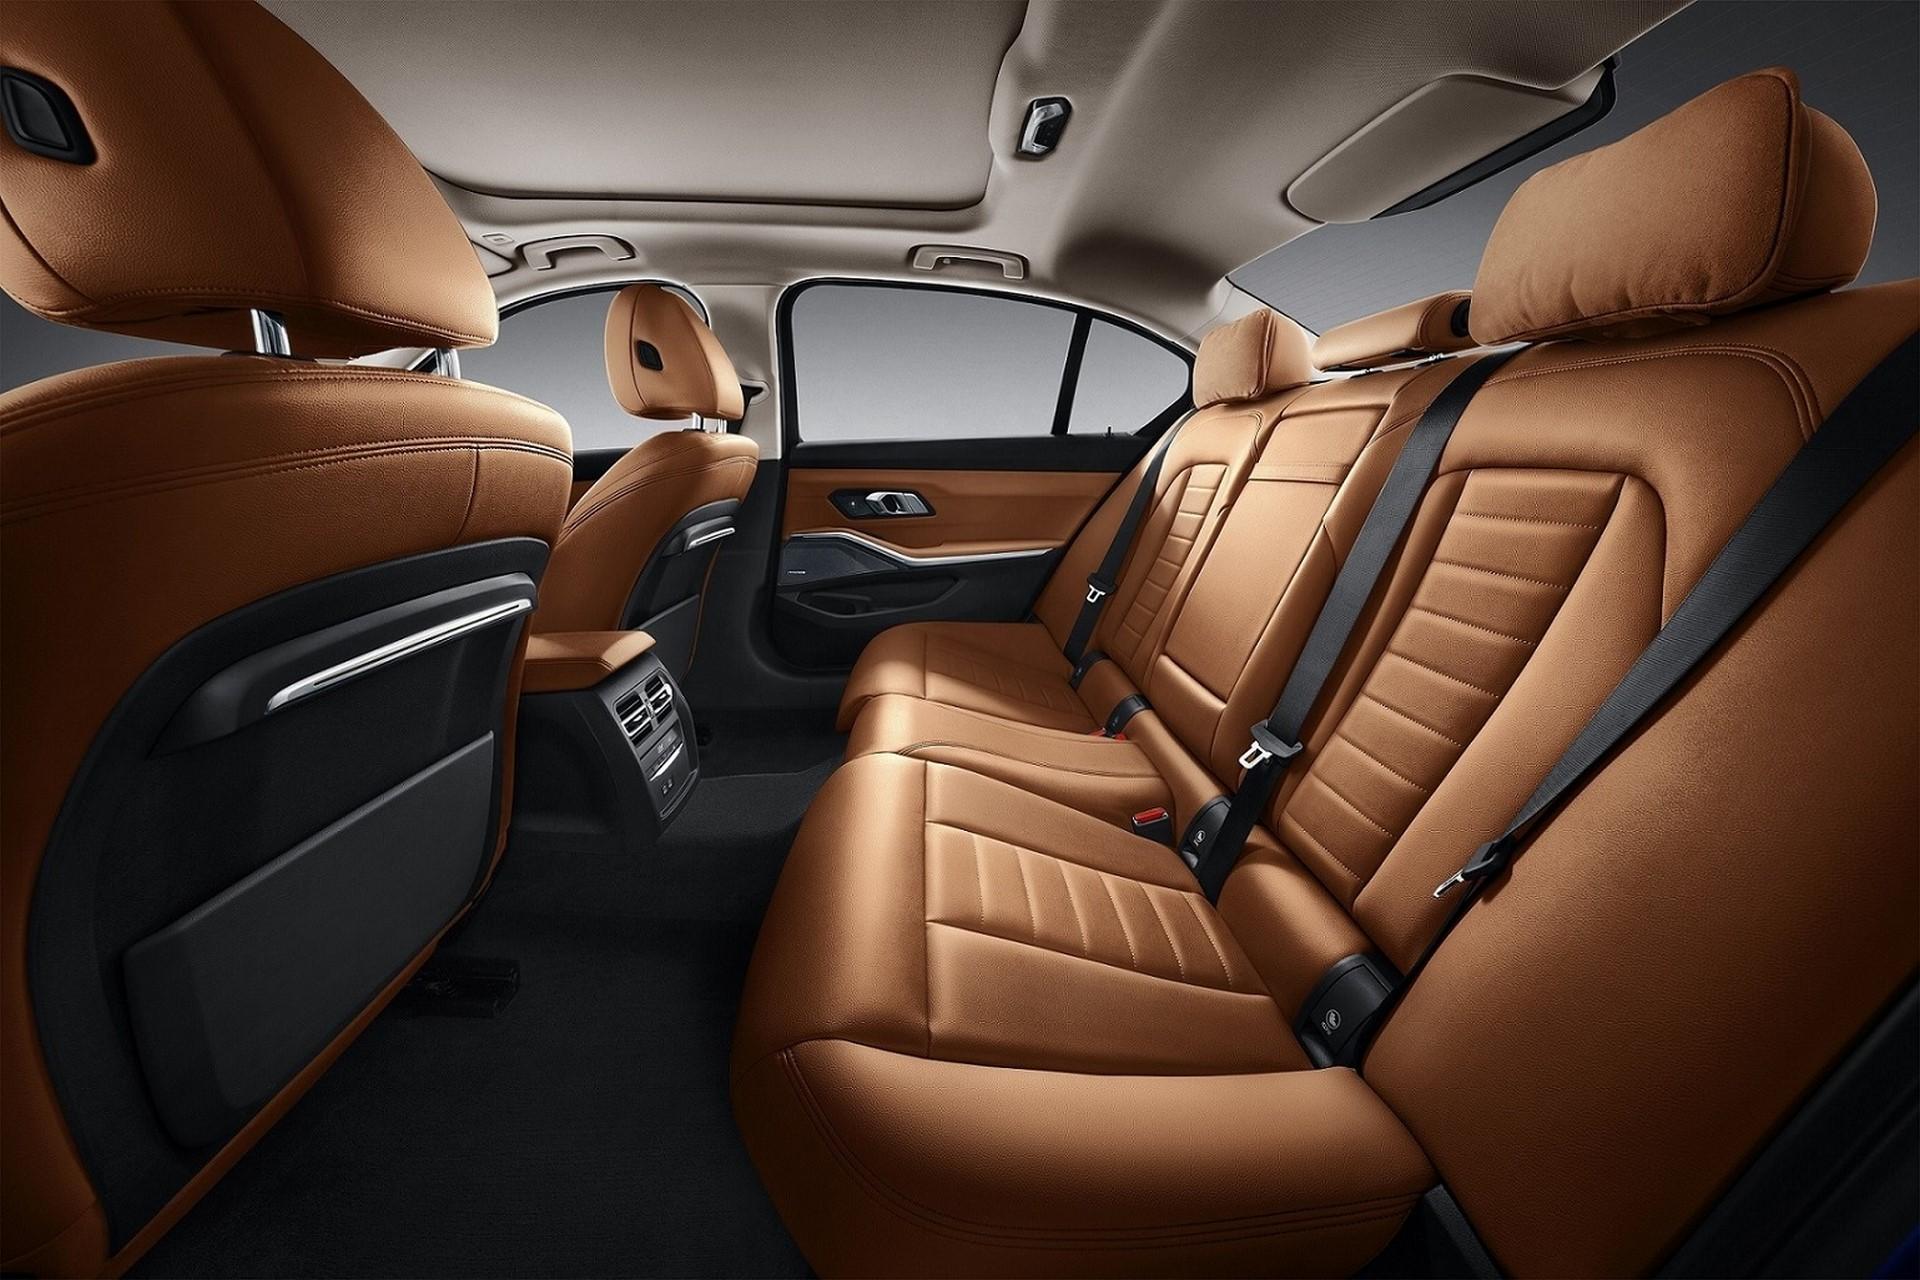 BMW-3-Series-LWB-Long-Wheelbase-2019-8